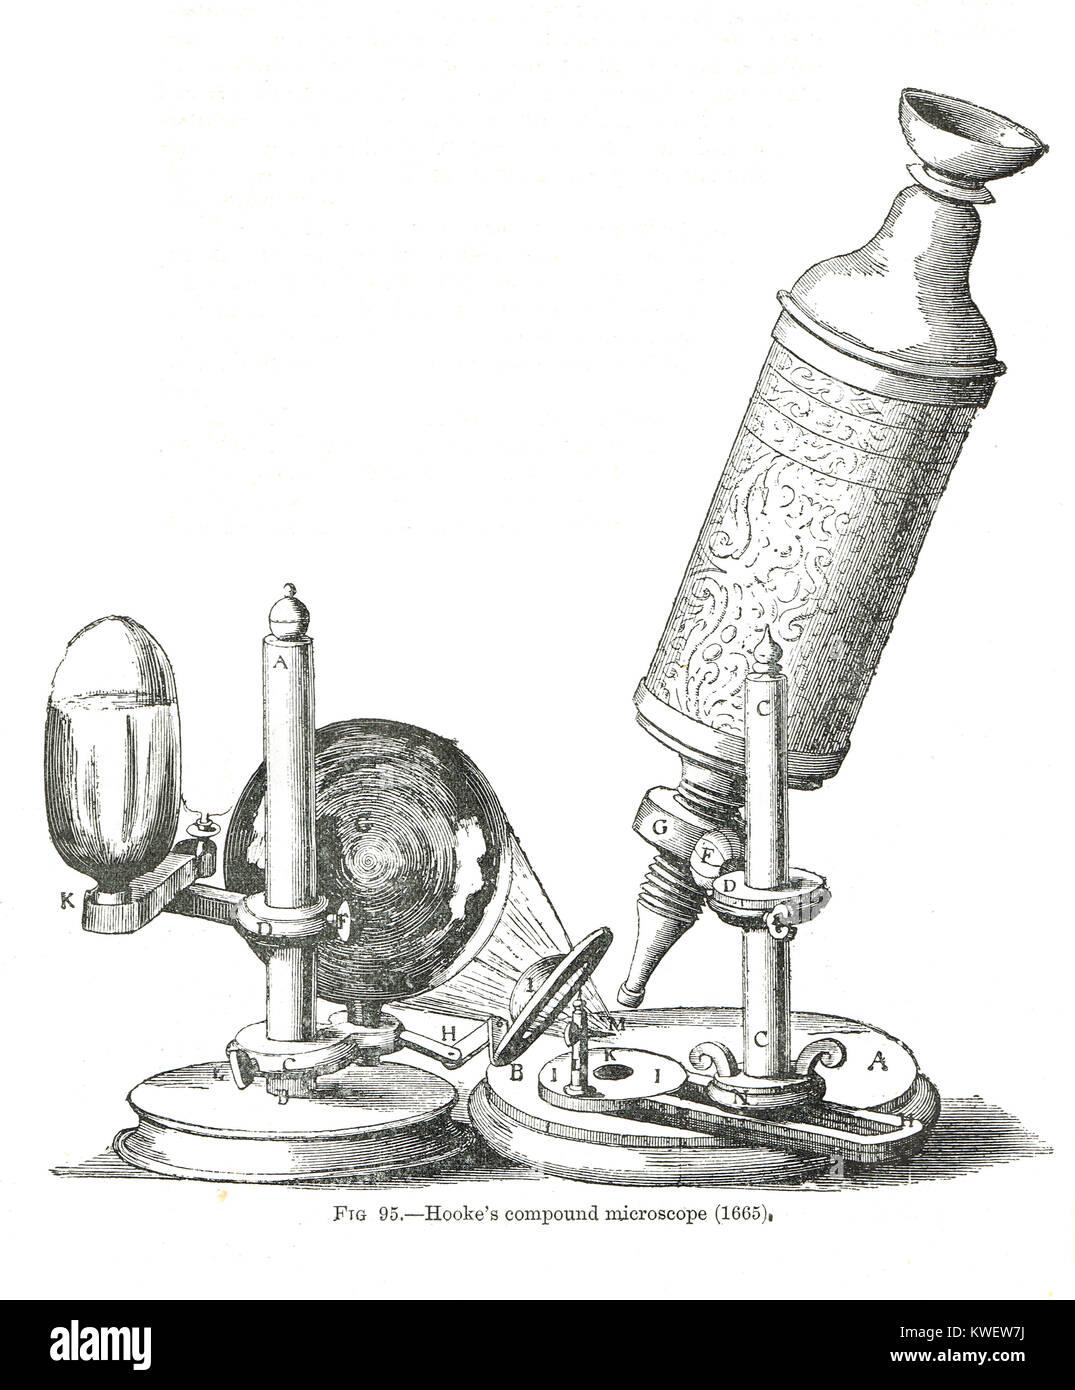 Robert Hooke's compound microscope of 1665 - Stock Image